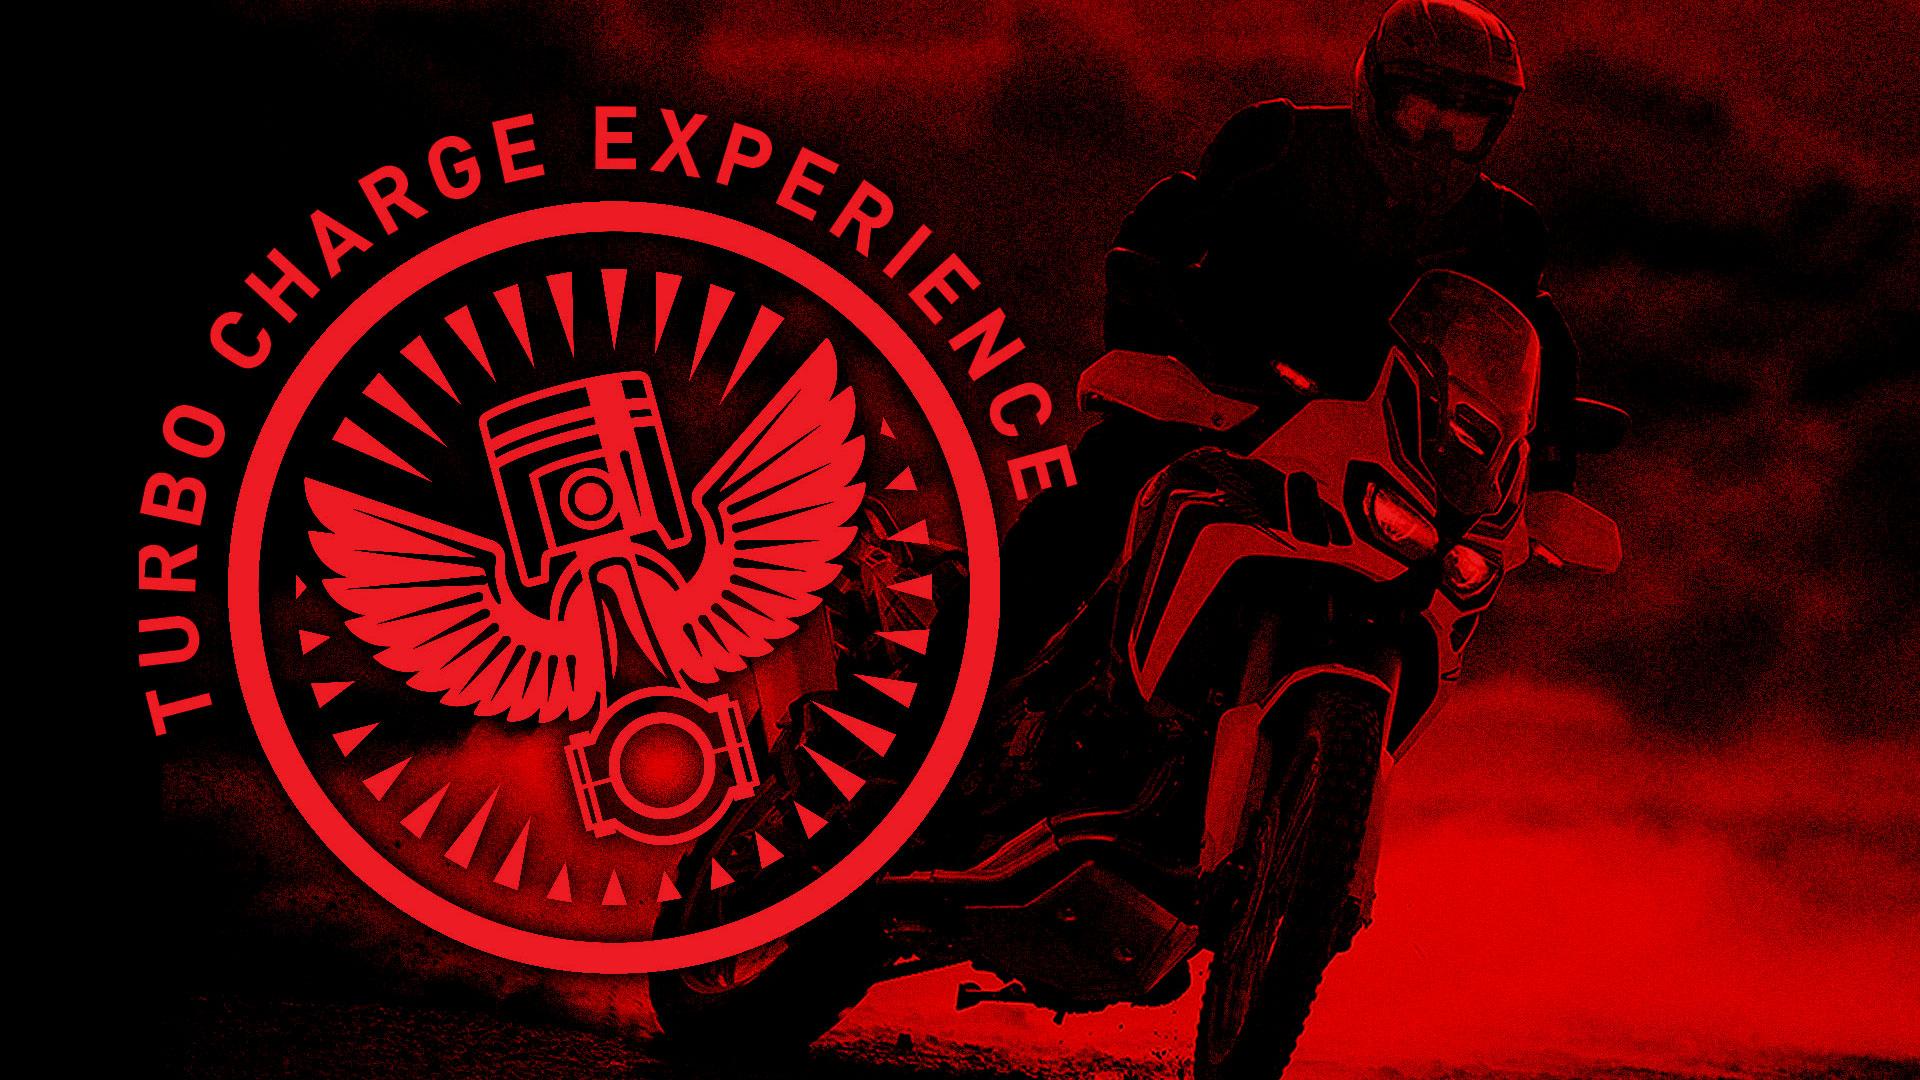 Ferrari Ice poster design for Platinum Beverages Limited